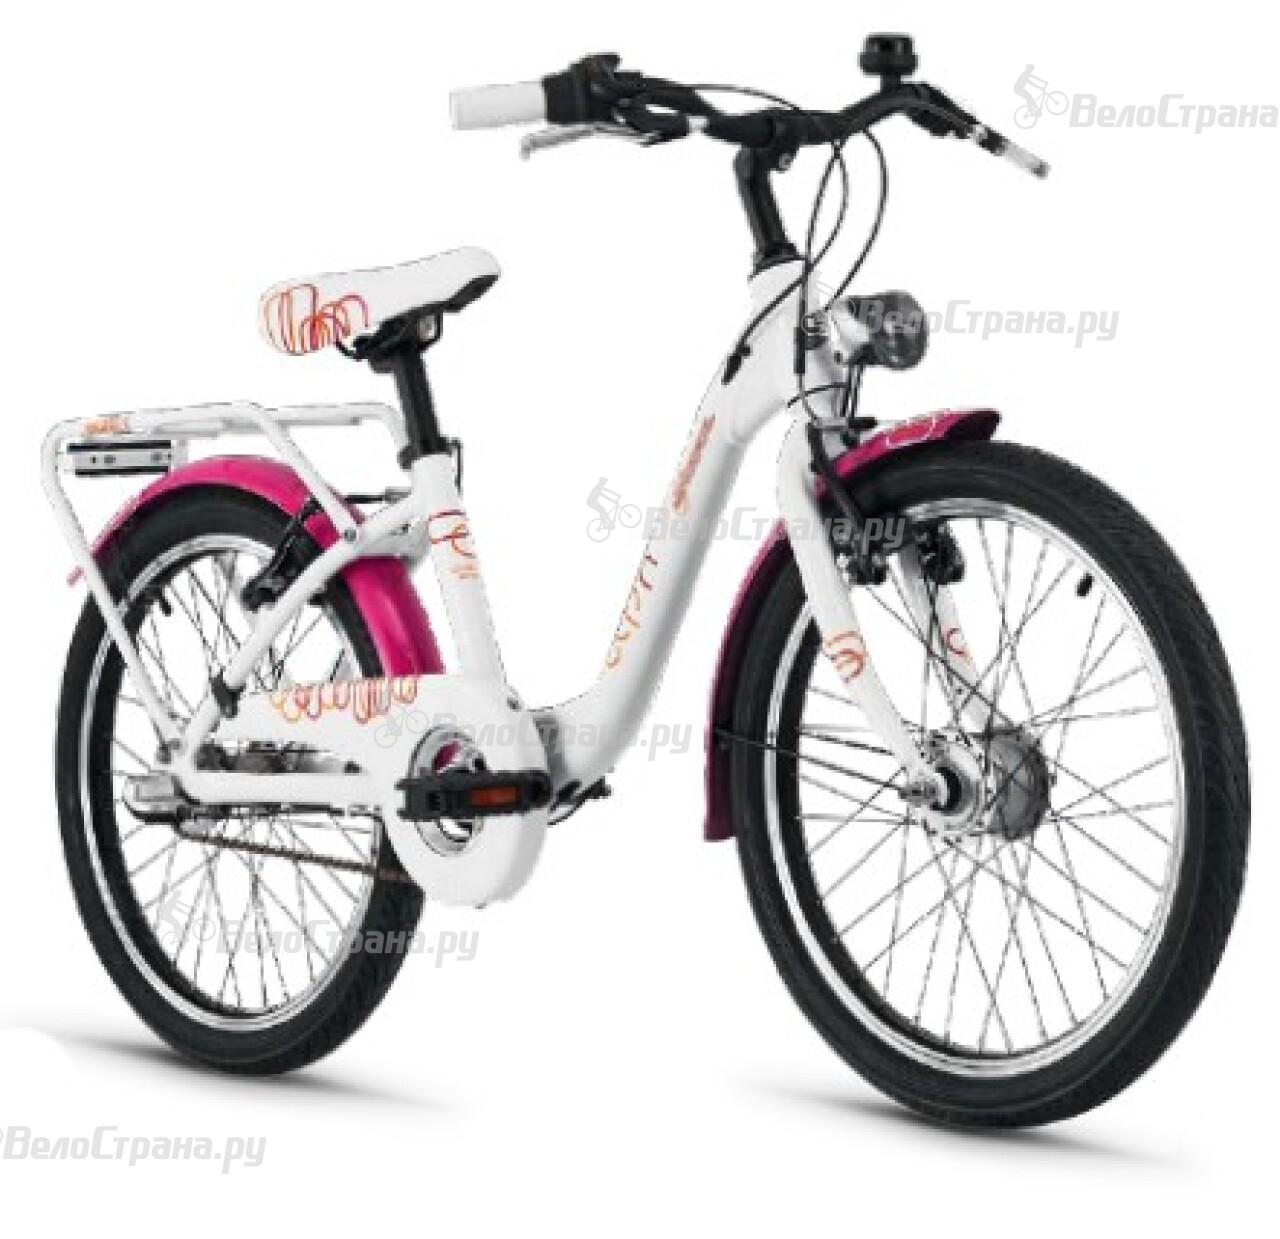 Велосипед Scool ChiX 20 3S (2014) цена